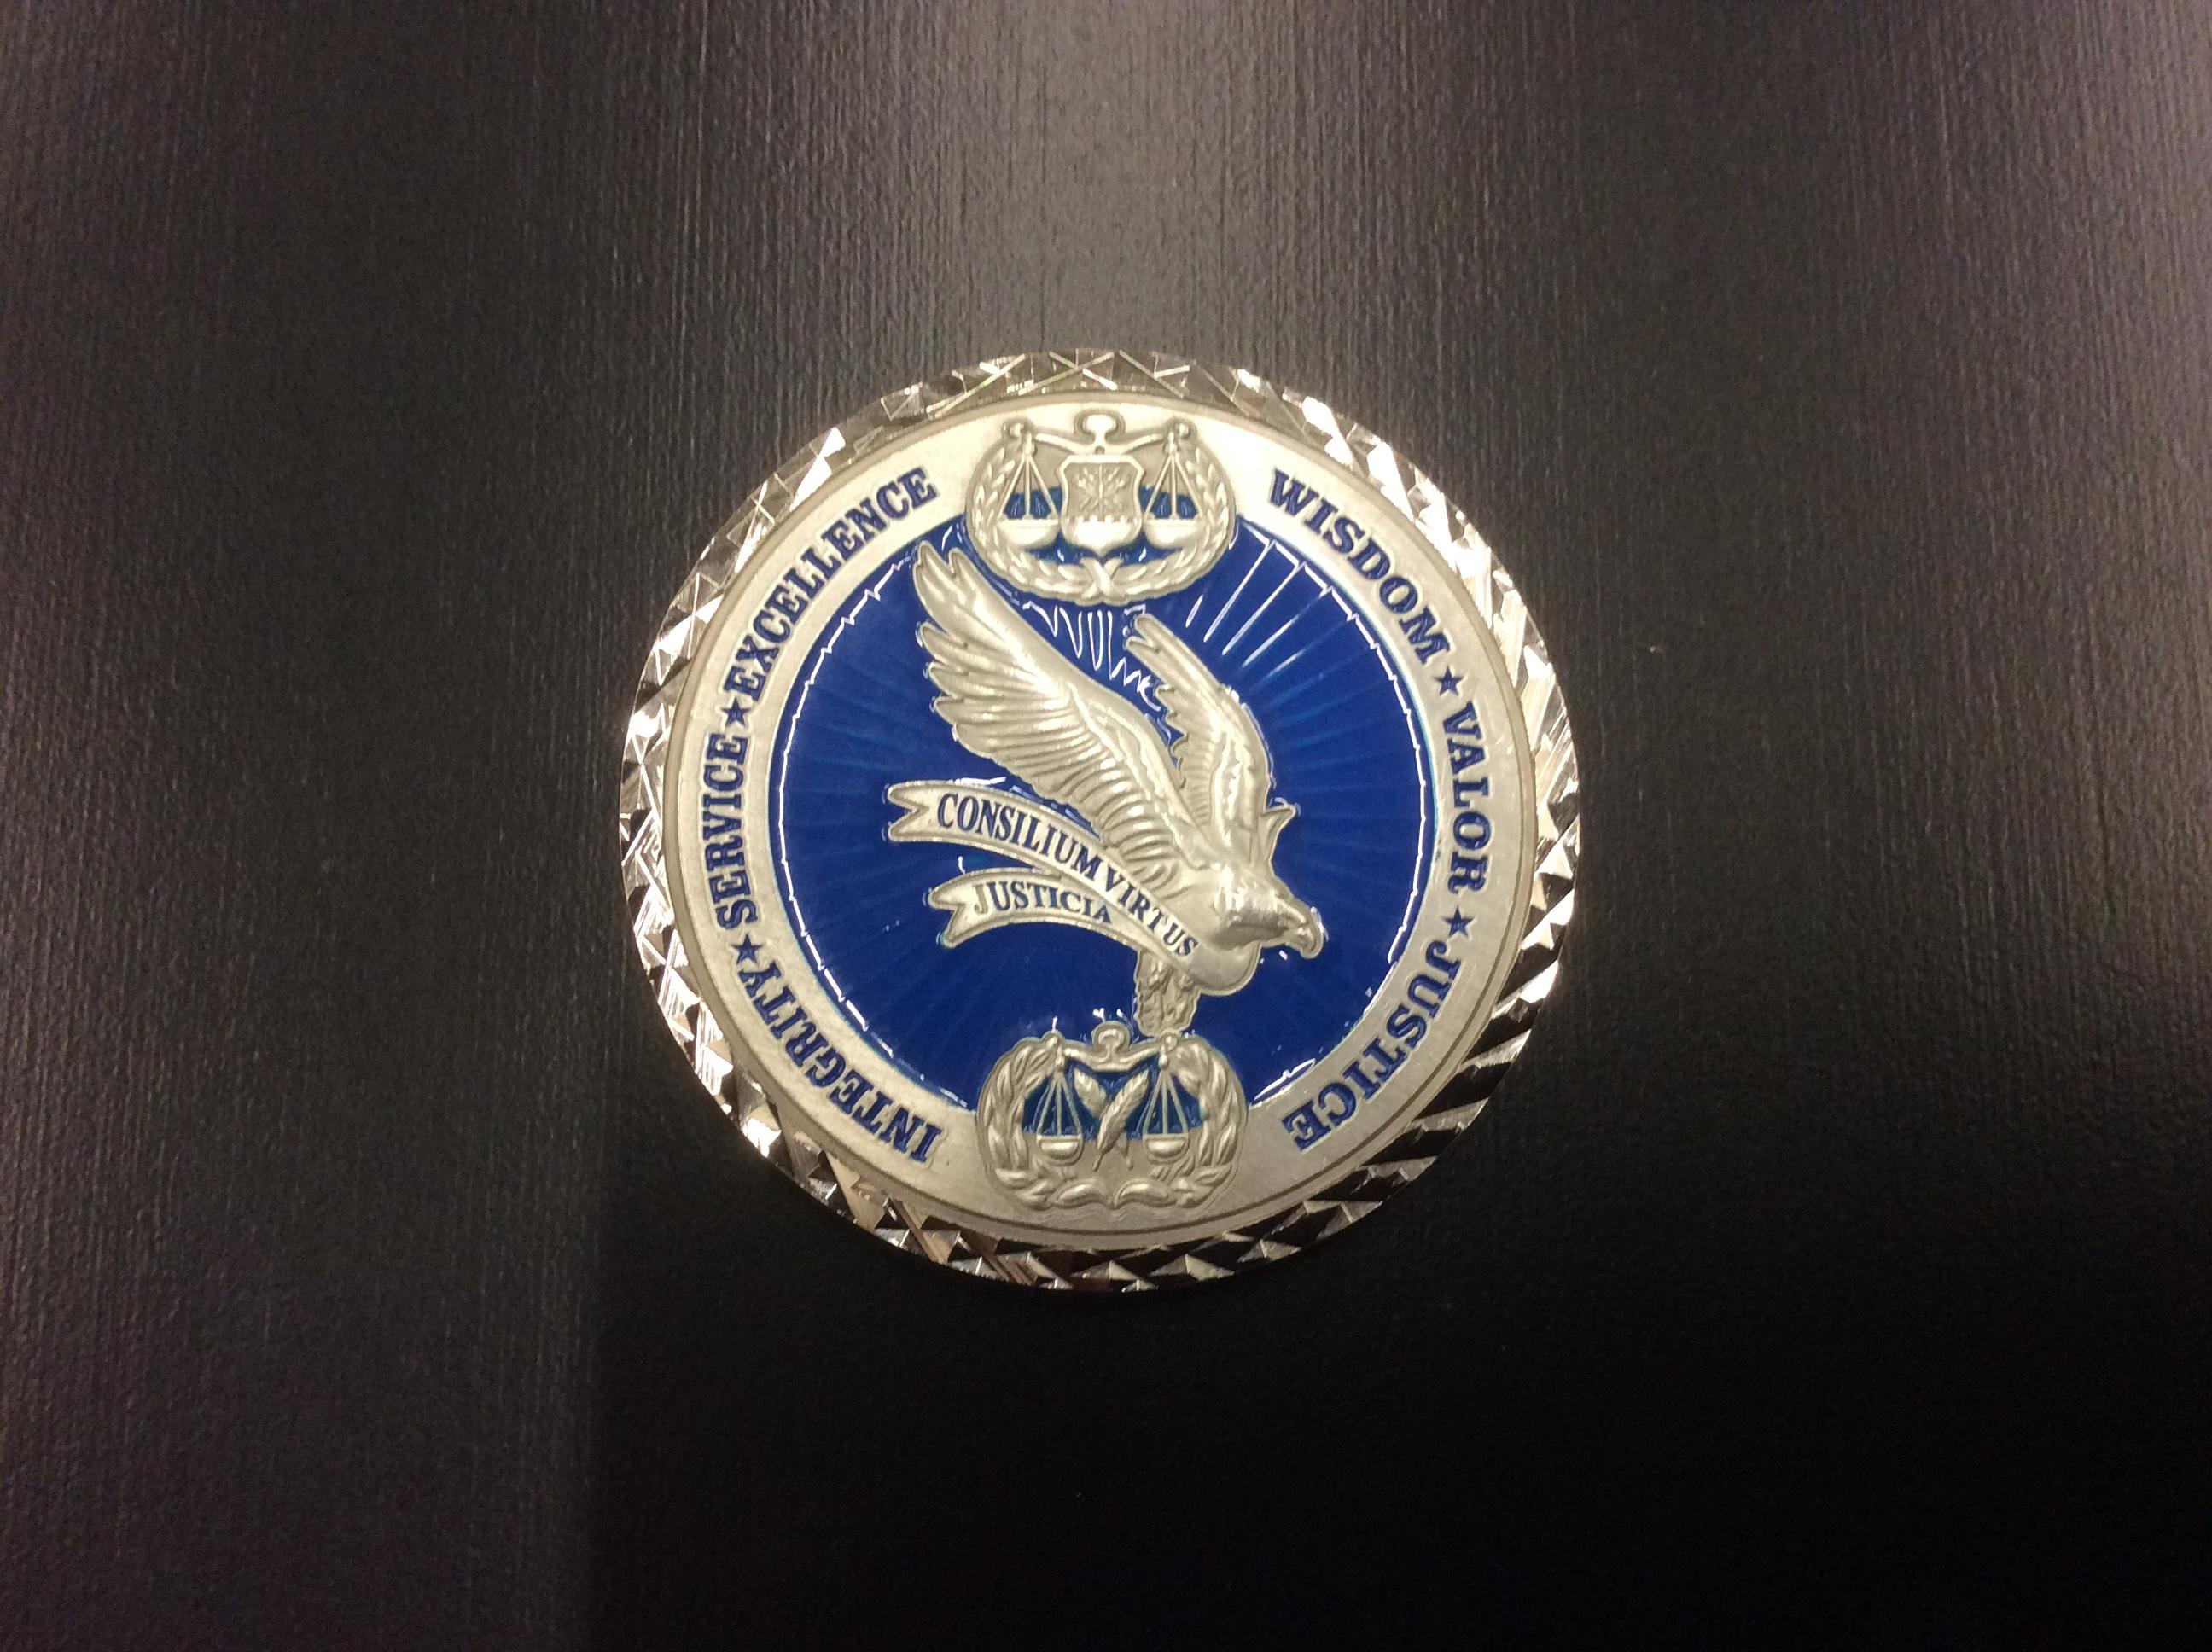 Burne_Lt Gen Christopher_coin front_04102015.JPG